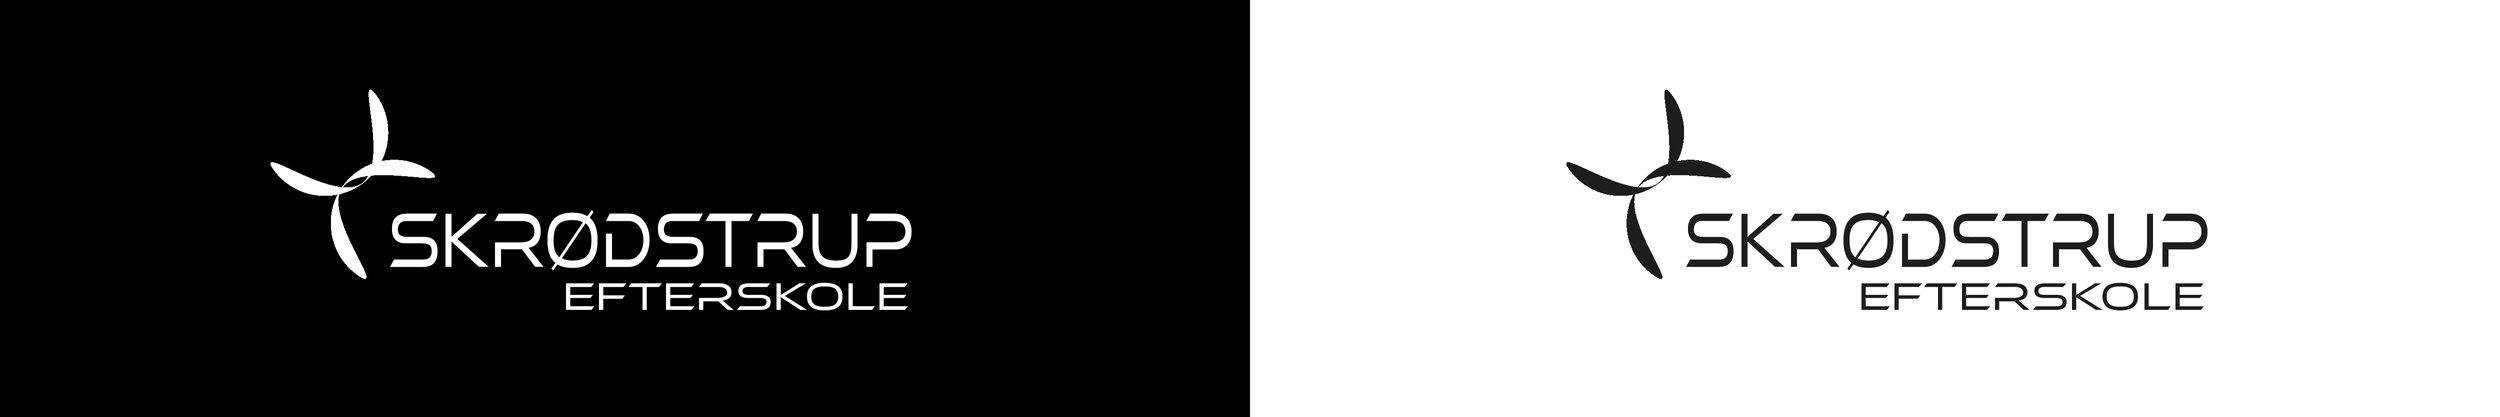 Logo Skrødstrup by Carsten Herholdt.jpg